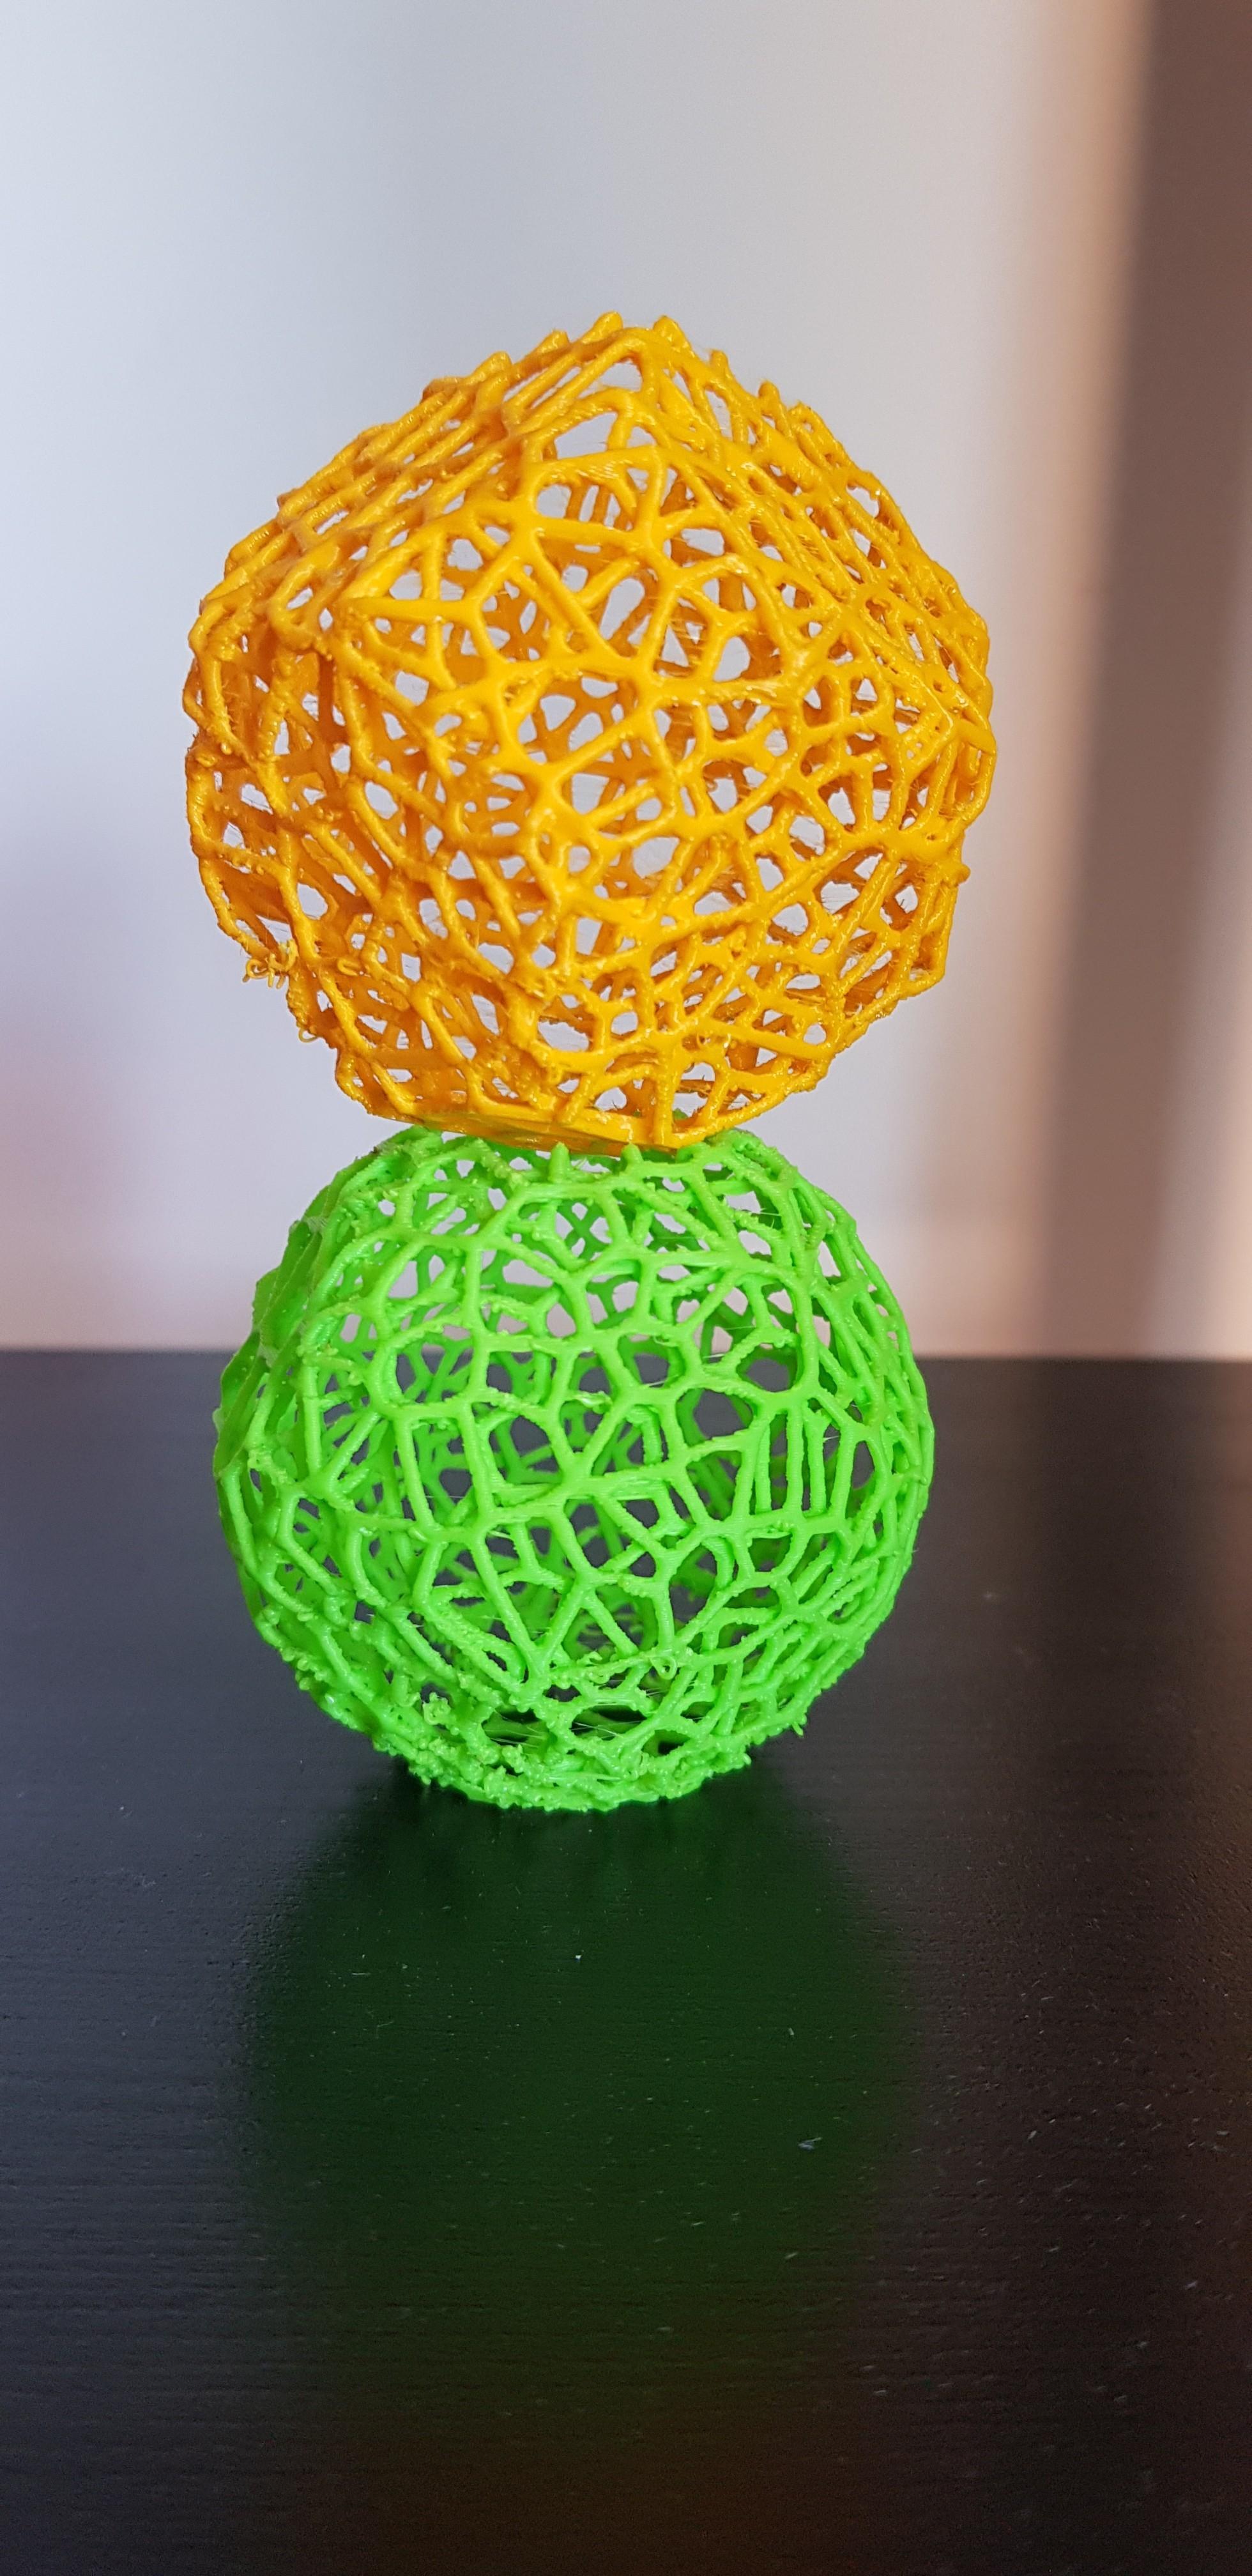 20180618_113609.jpg Download free STL file voronoi pot • 3D printer template, solunkejagruti